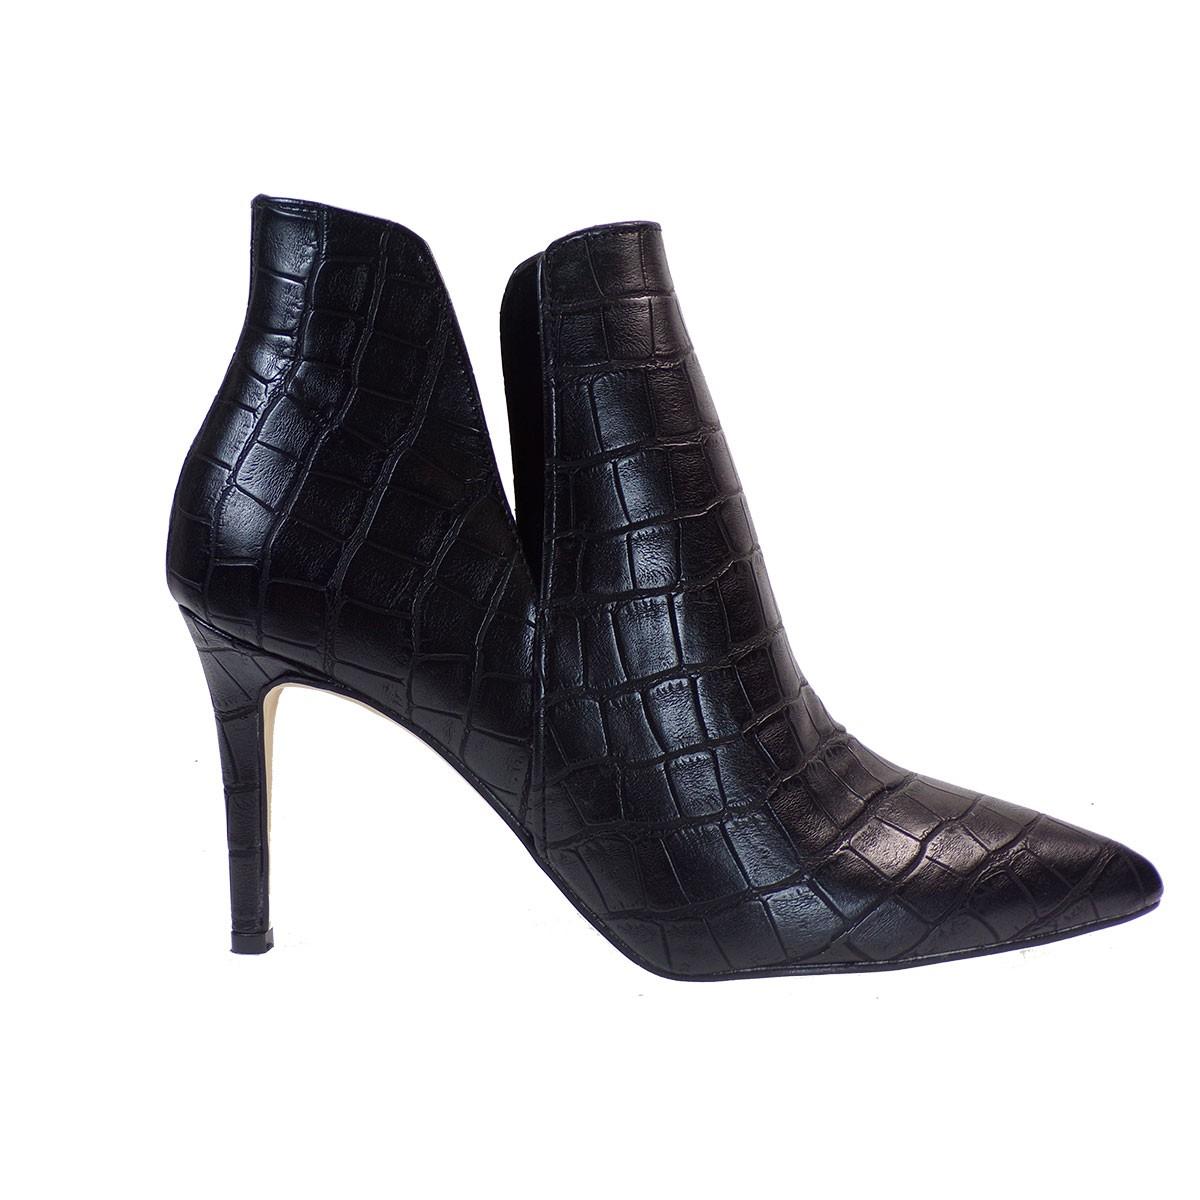 Alessandra Paggioti Γυναικεία Παπούτσια Μποτάκια 81640 Mαύρο Κροκό